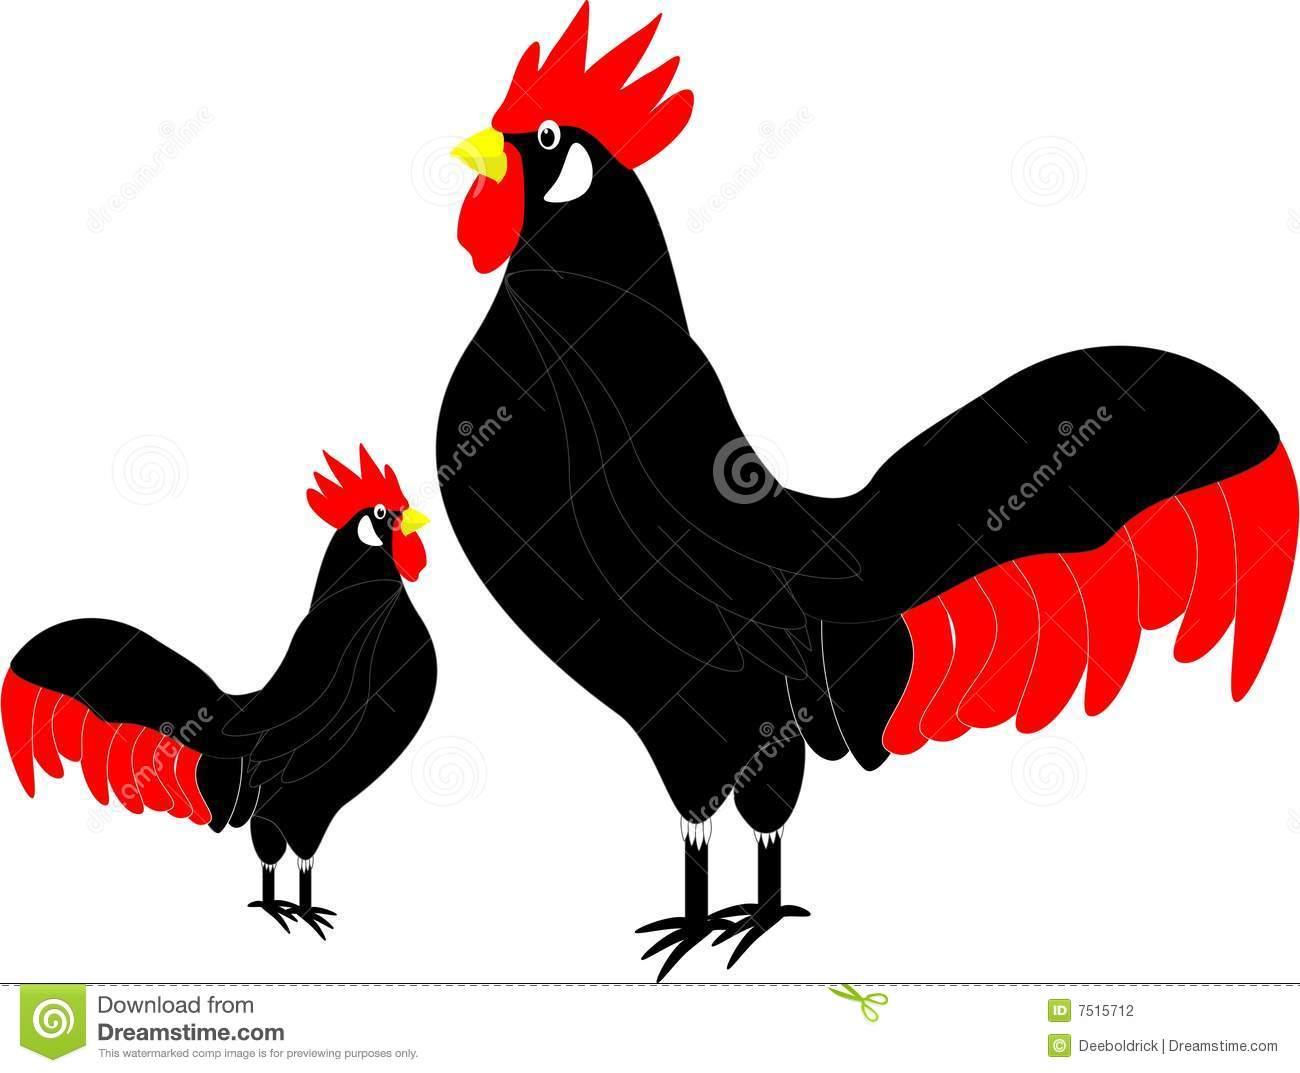 Clip art rooster stock vector. Illustration of proud, illustration.